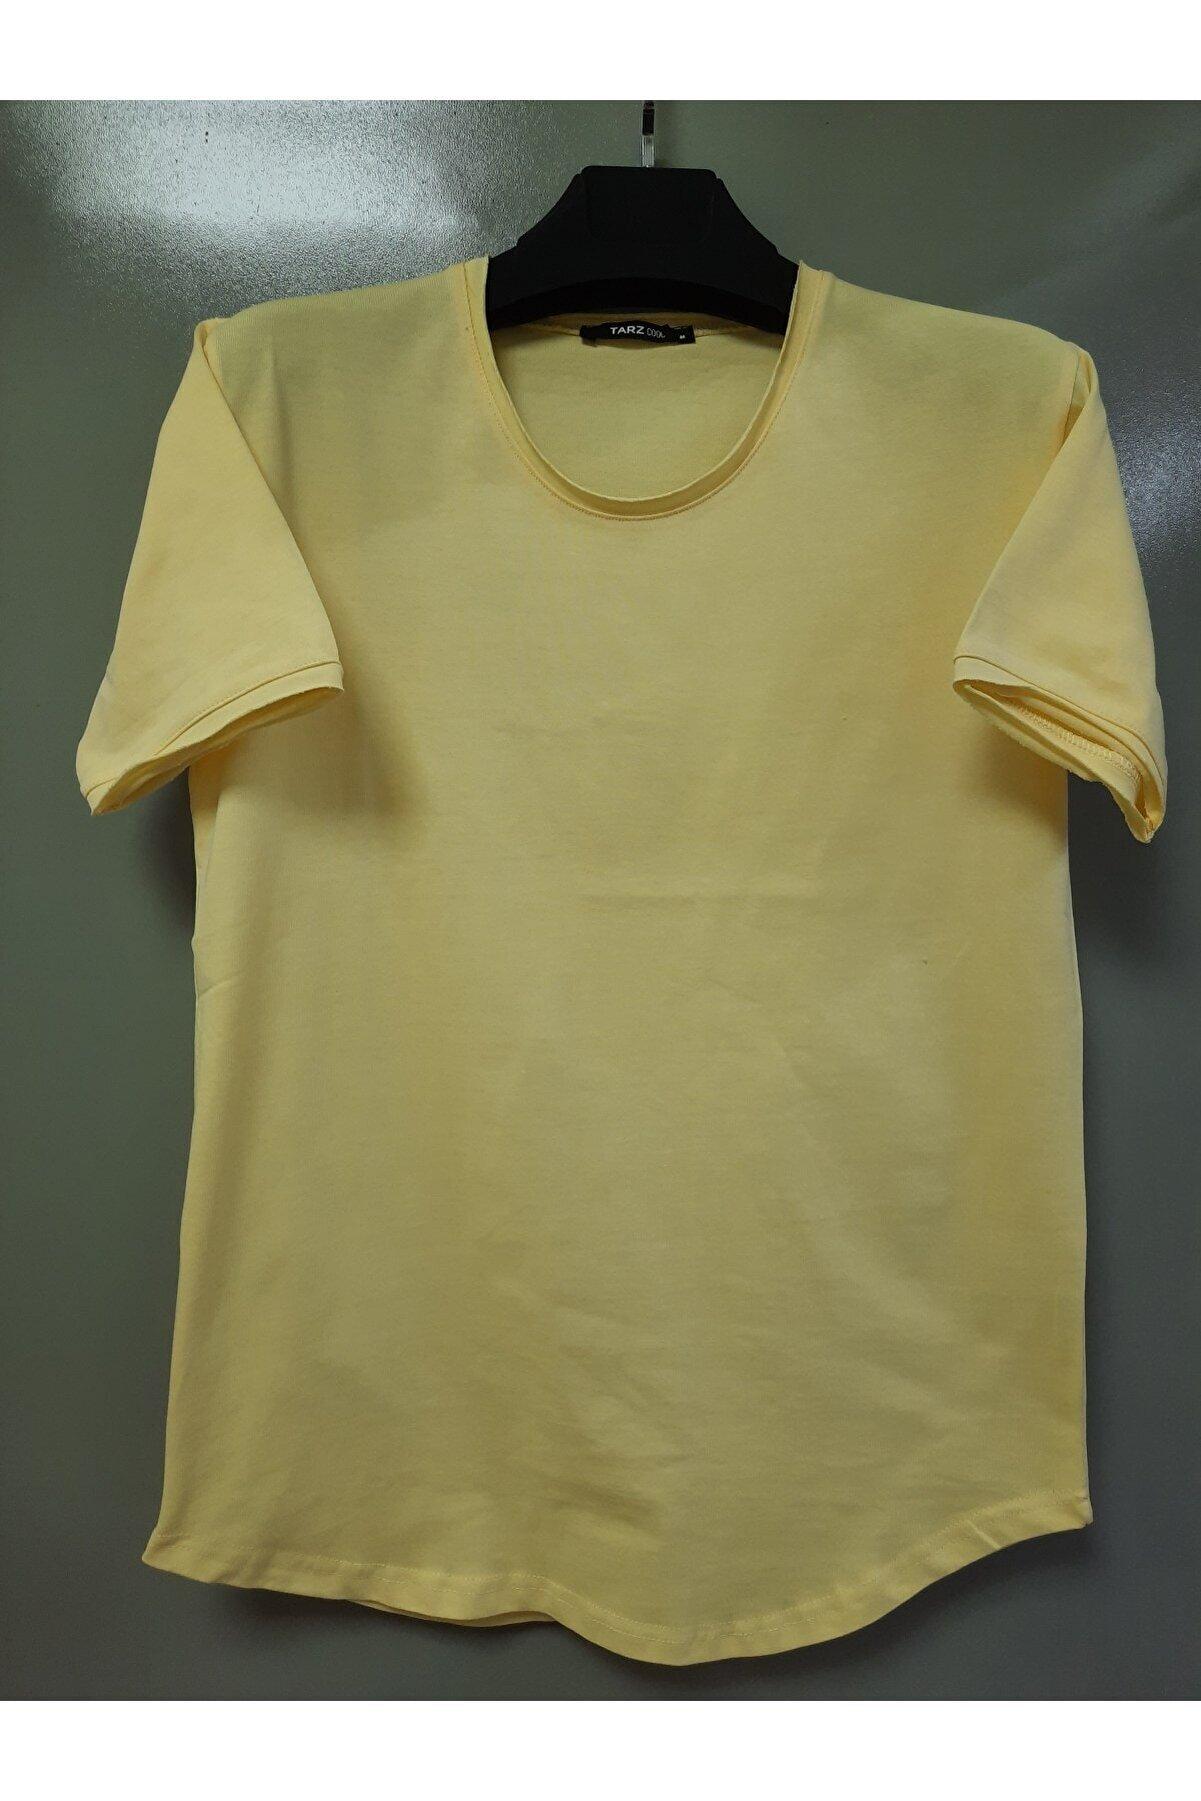 Tarz Cool Erkek Limoni Pis Yaka Salaş T-shirt